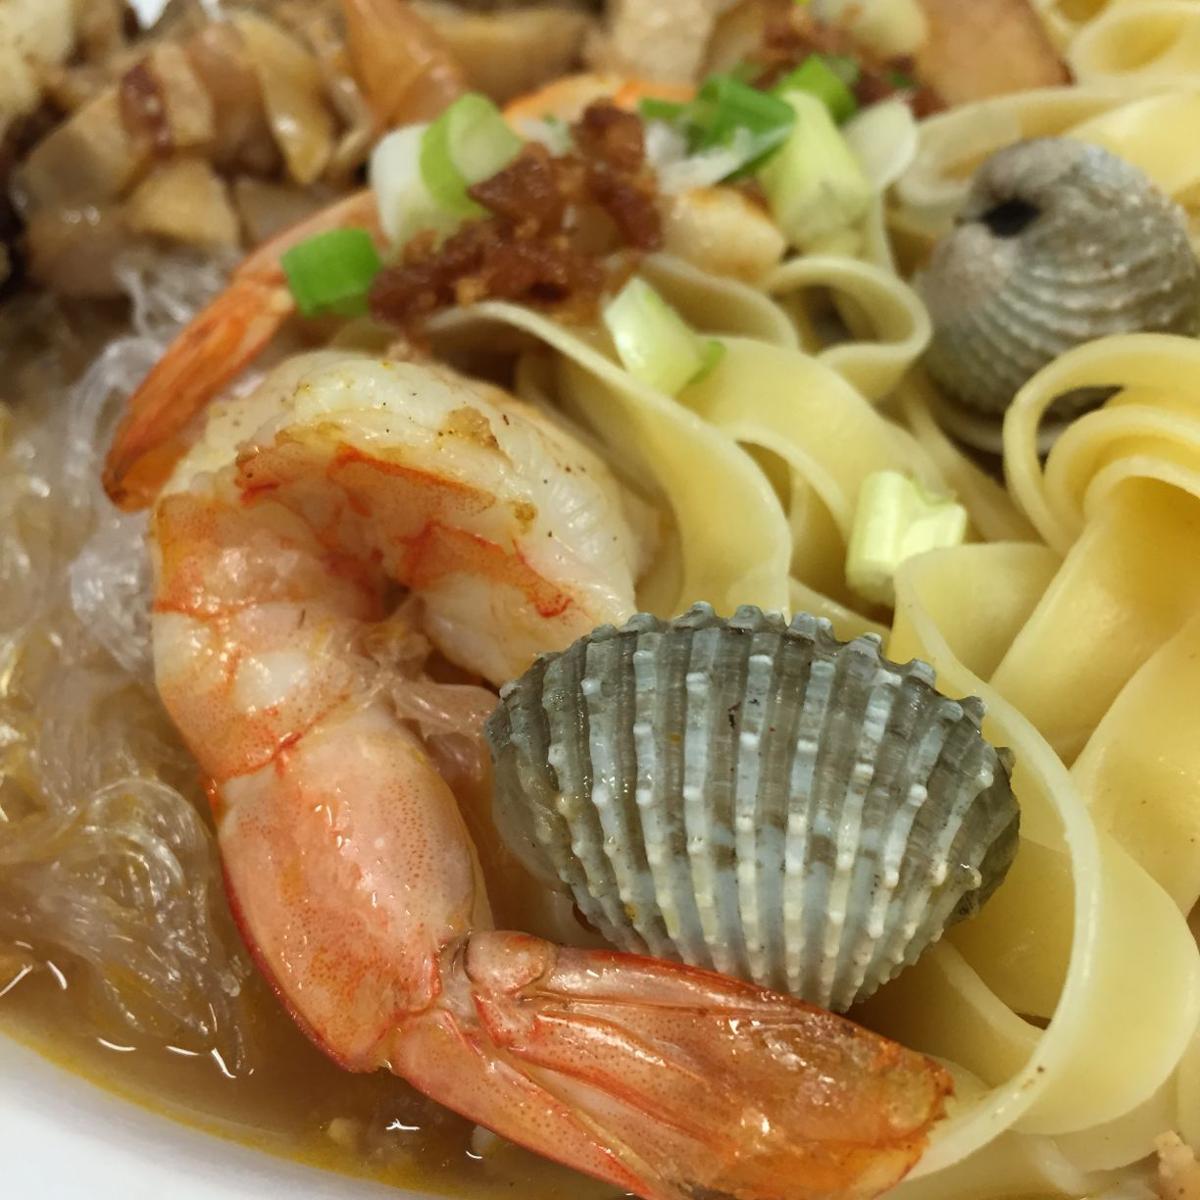 Hiro Asian Kitchen To Host Weekly Filipino Pop-Up